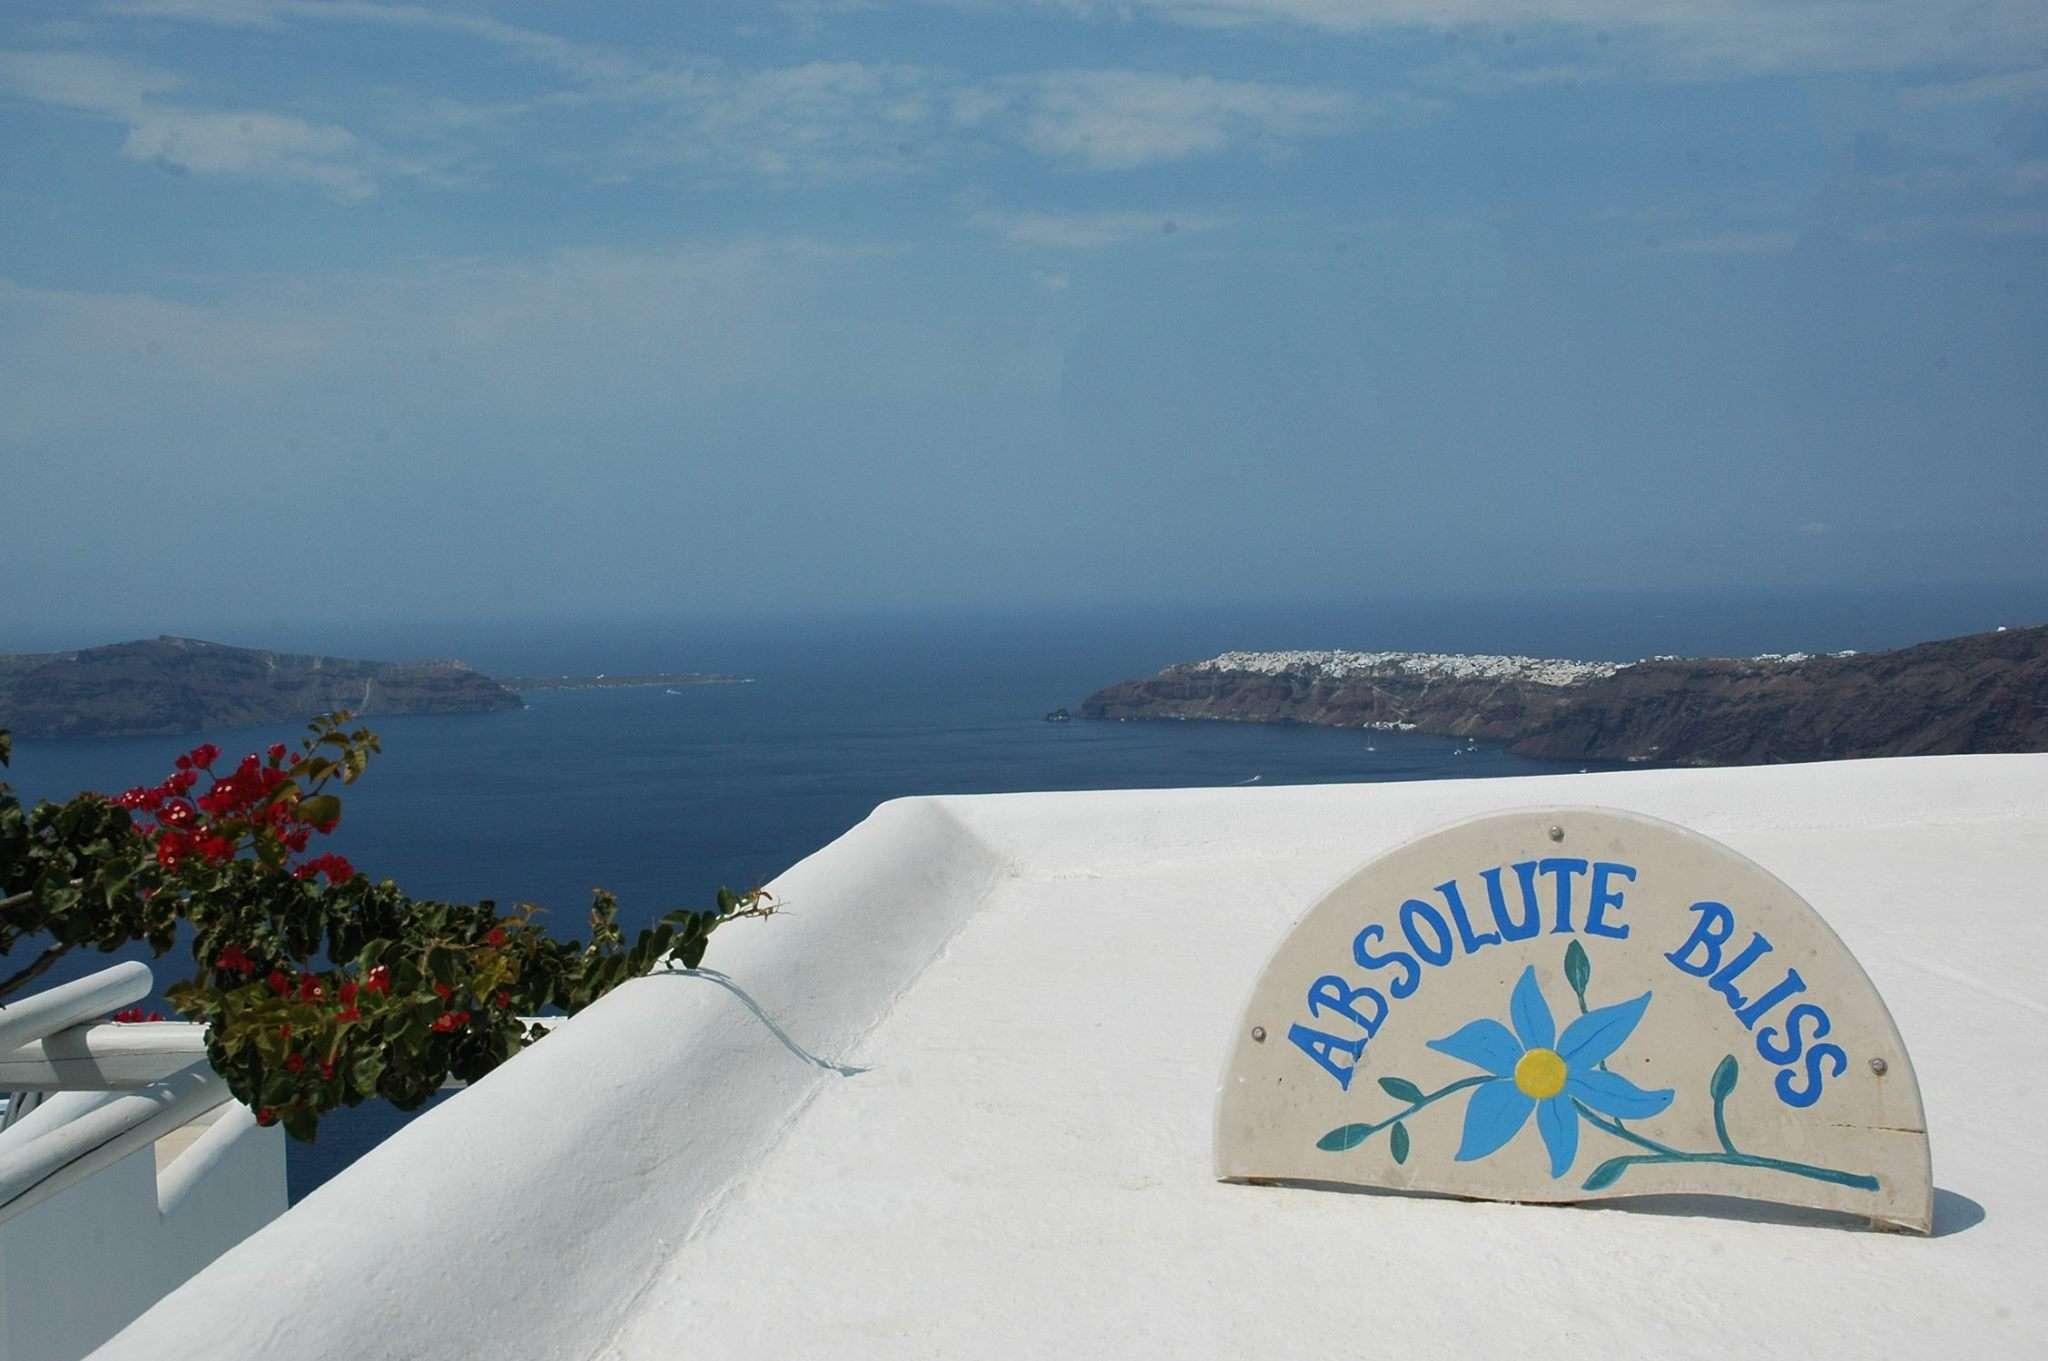 Absolute Bliss Hotel, Santorini